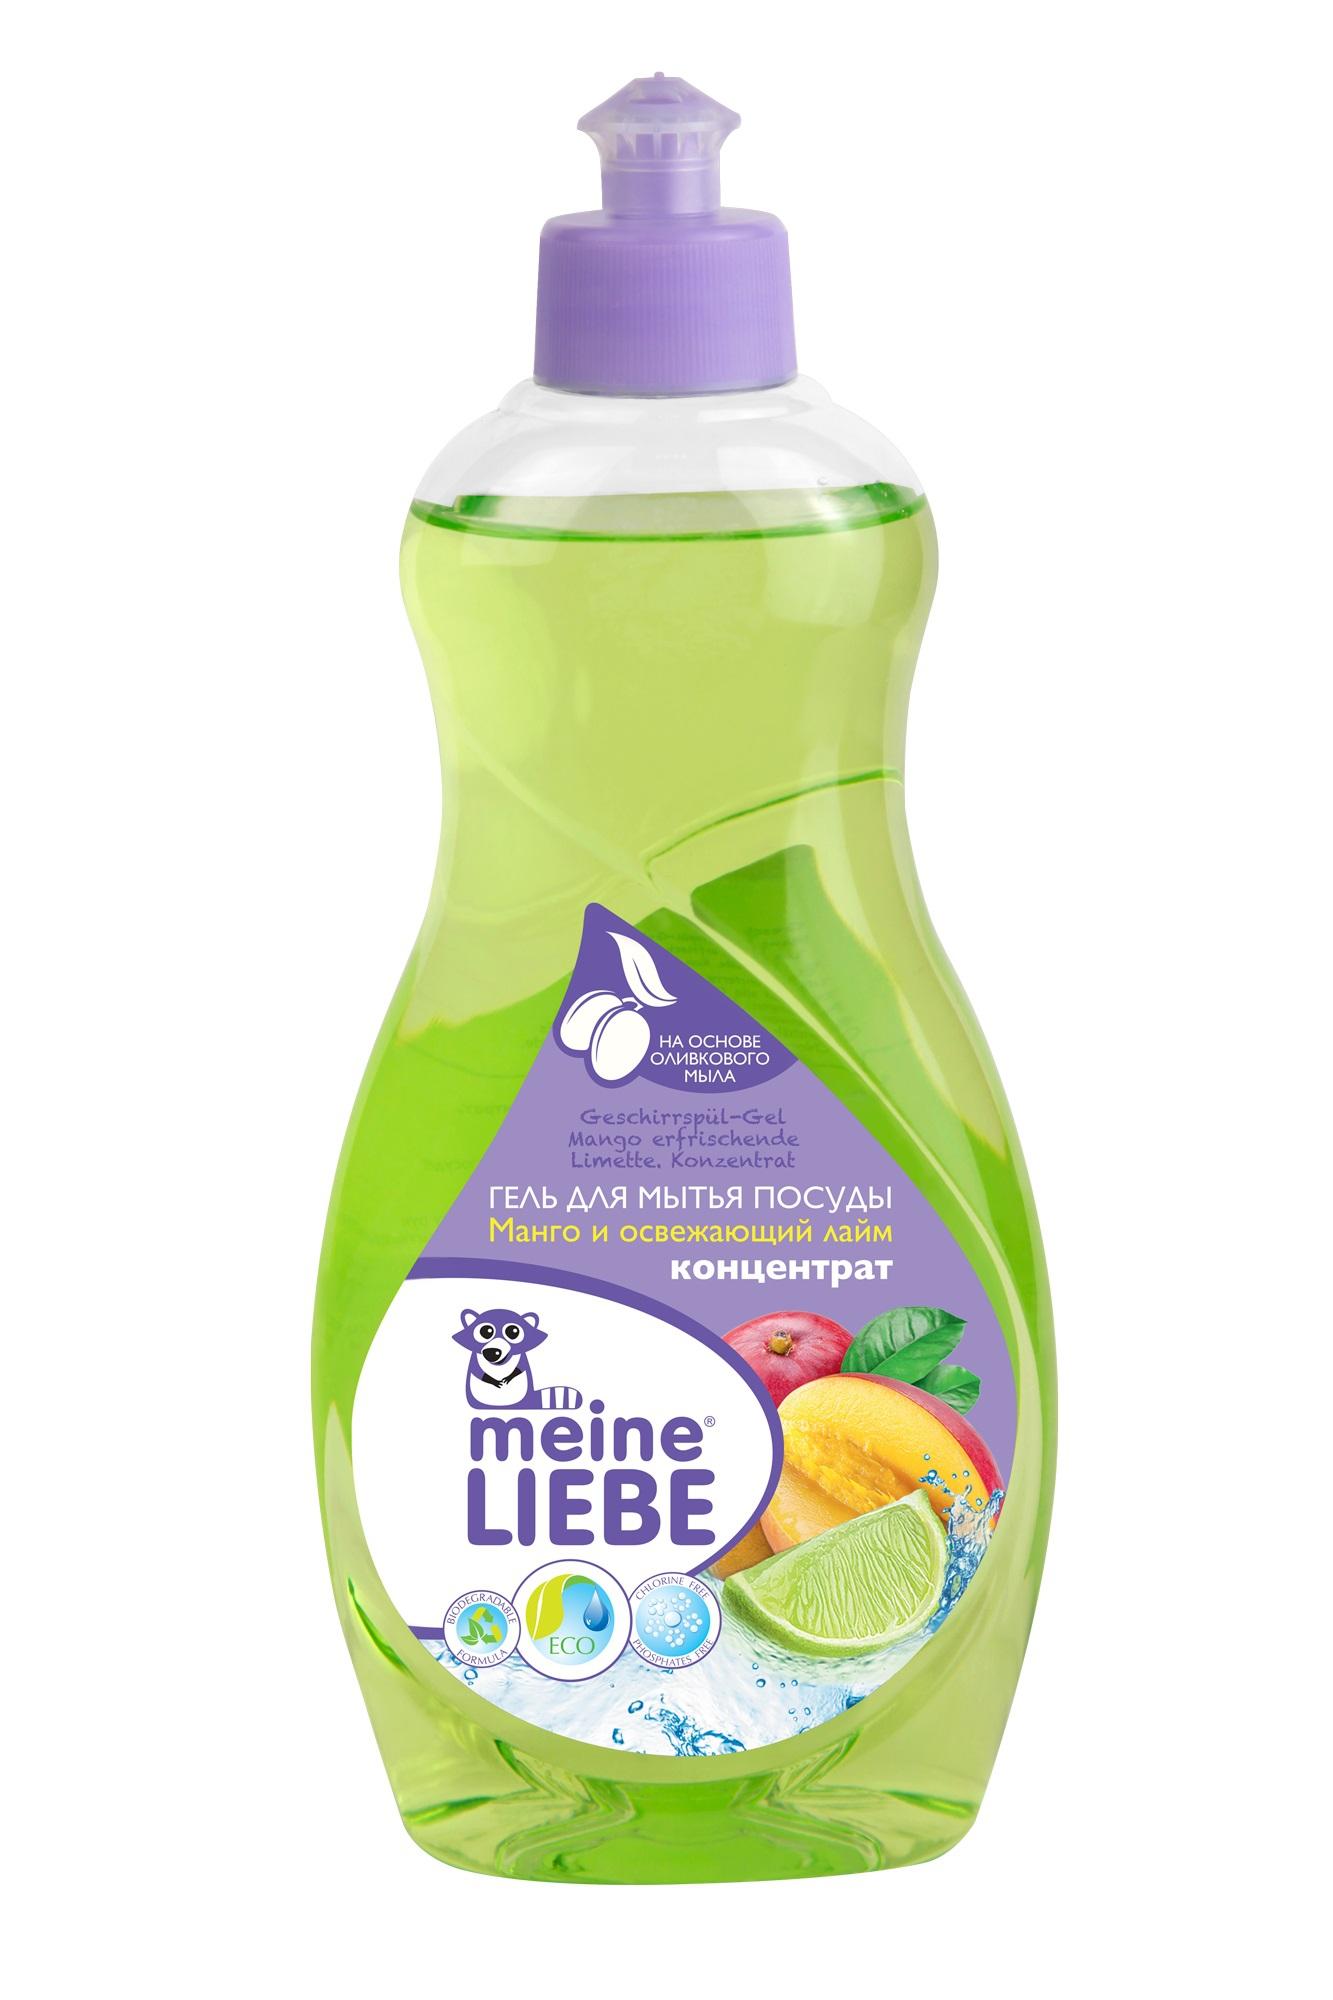 Средства для мытья посуды Meine Liebe Манго/Лайм концентрат 500 мл цена и фото